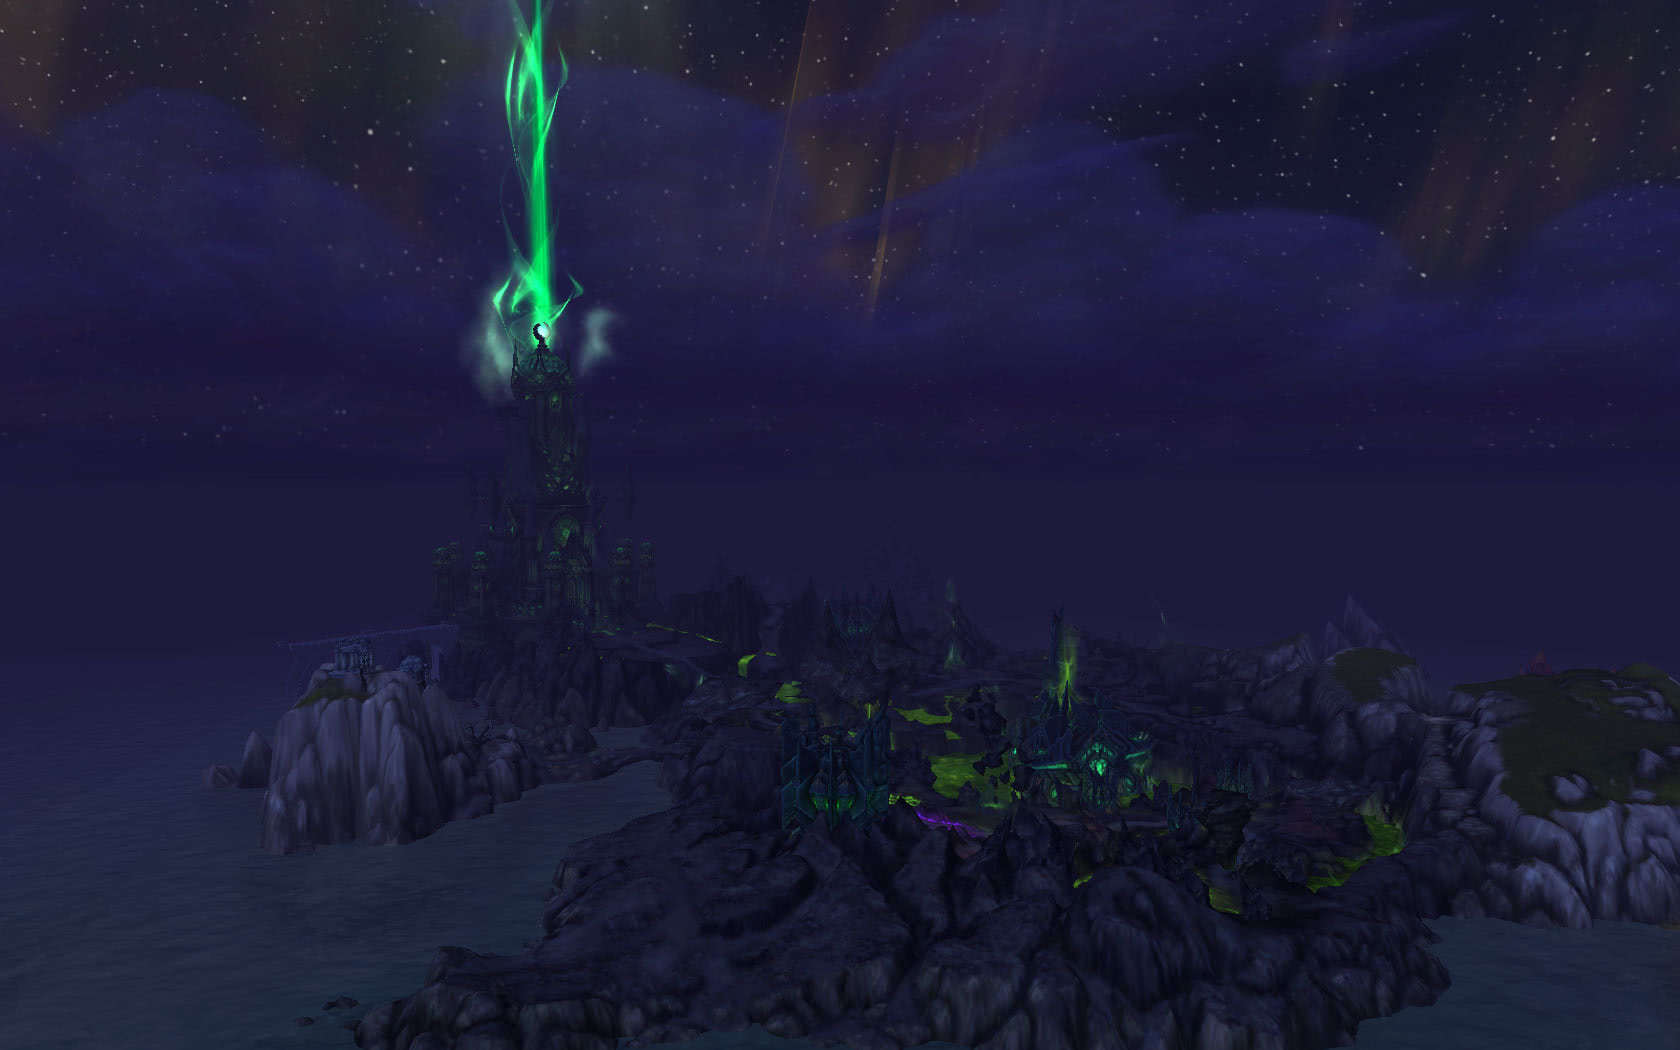 World of warcraft vr night elf - 1 10